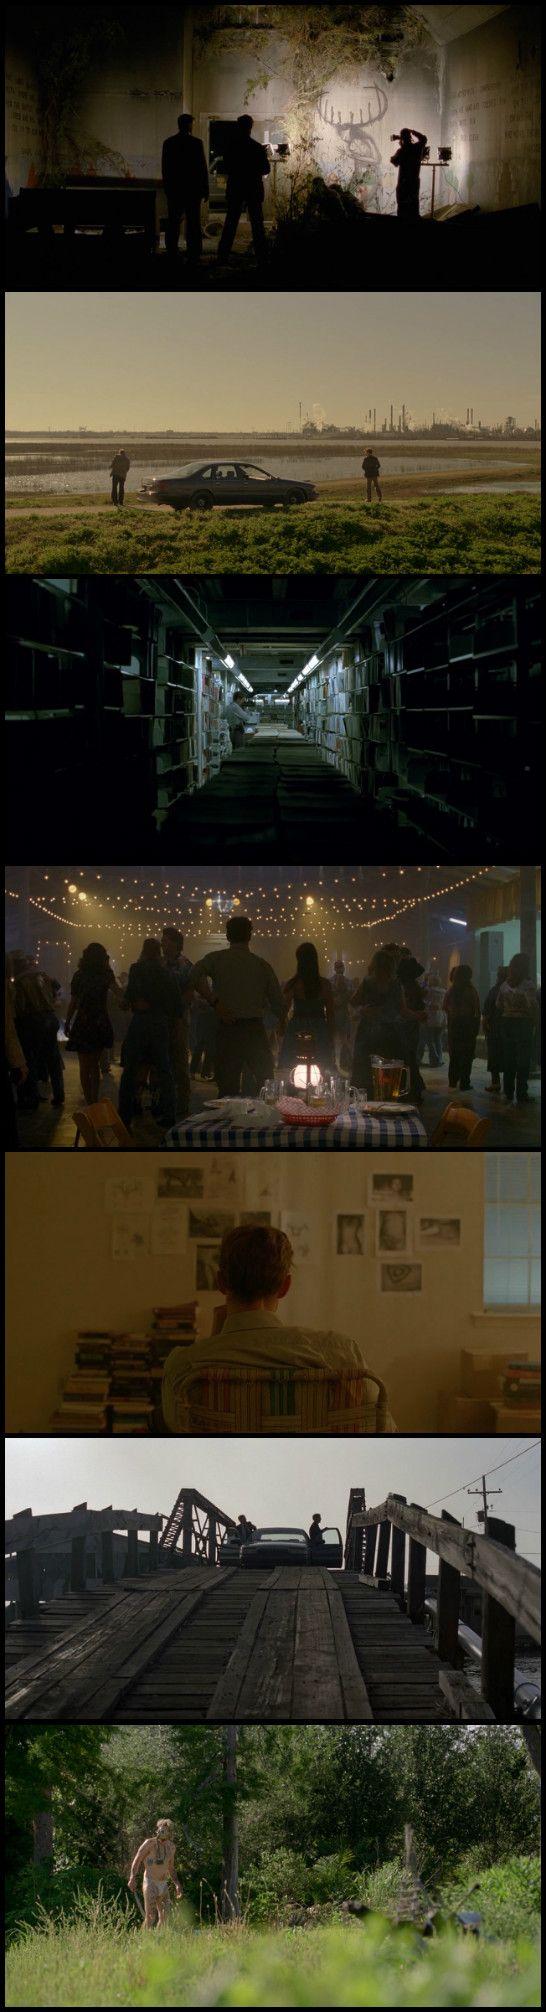 True Detective, episode 3 (2014) Director: Cary Joji Fukunaga. Photography: Adam Arkapaw.